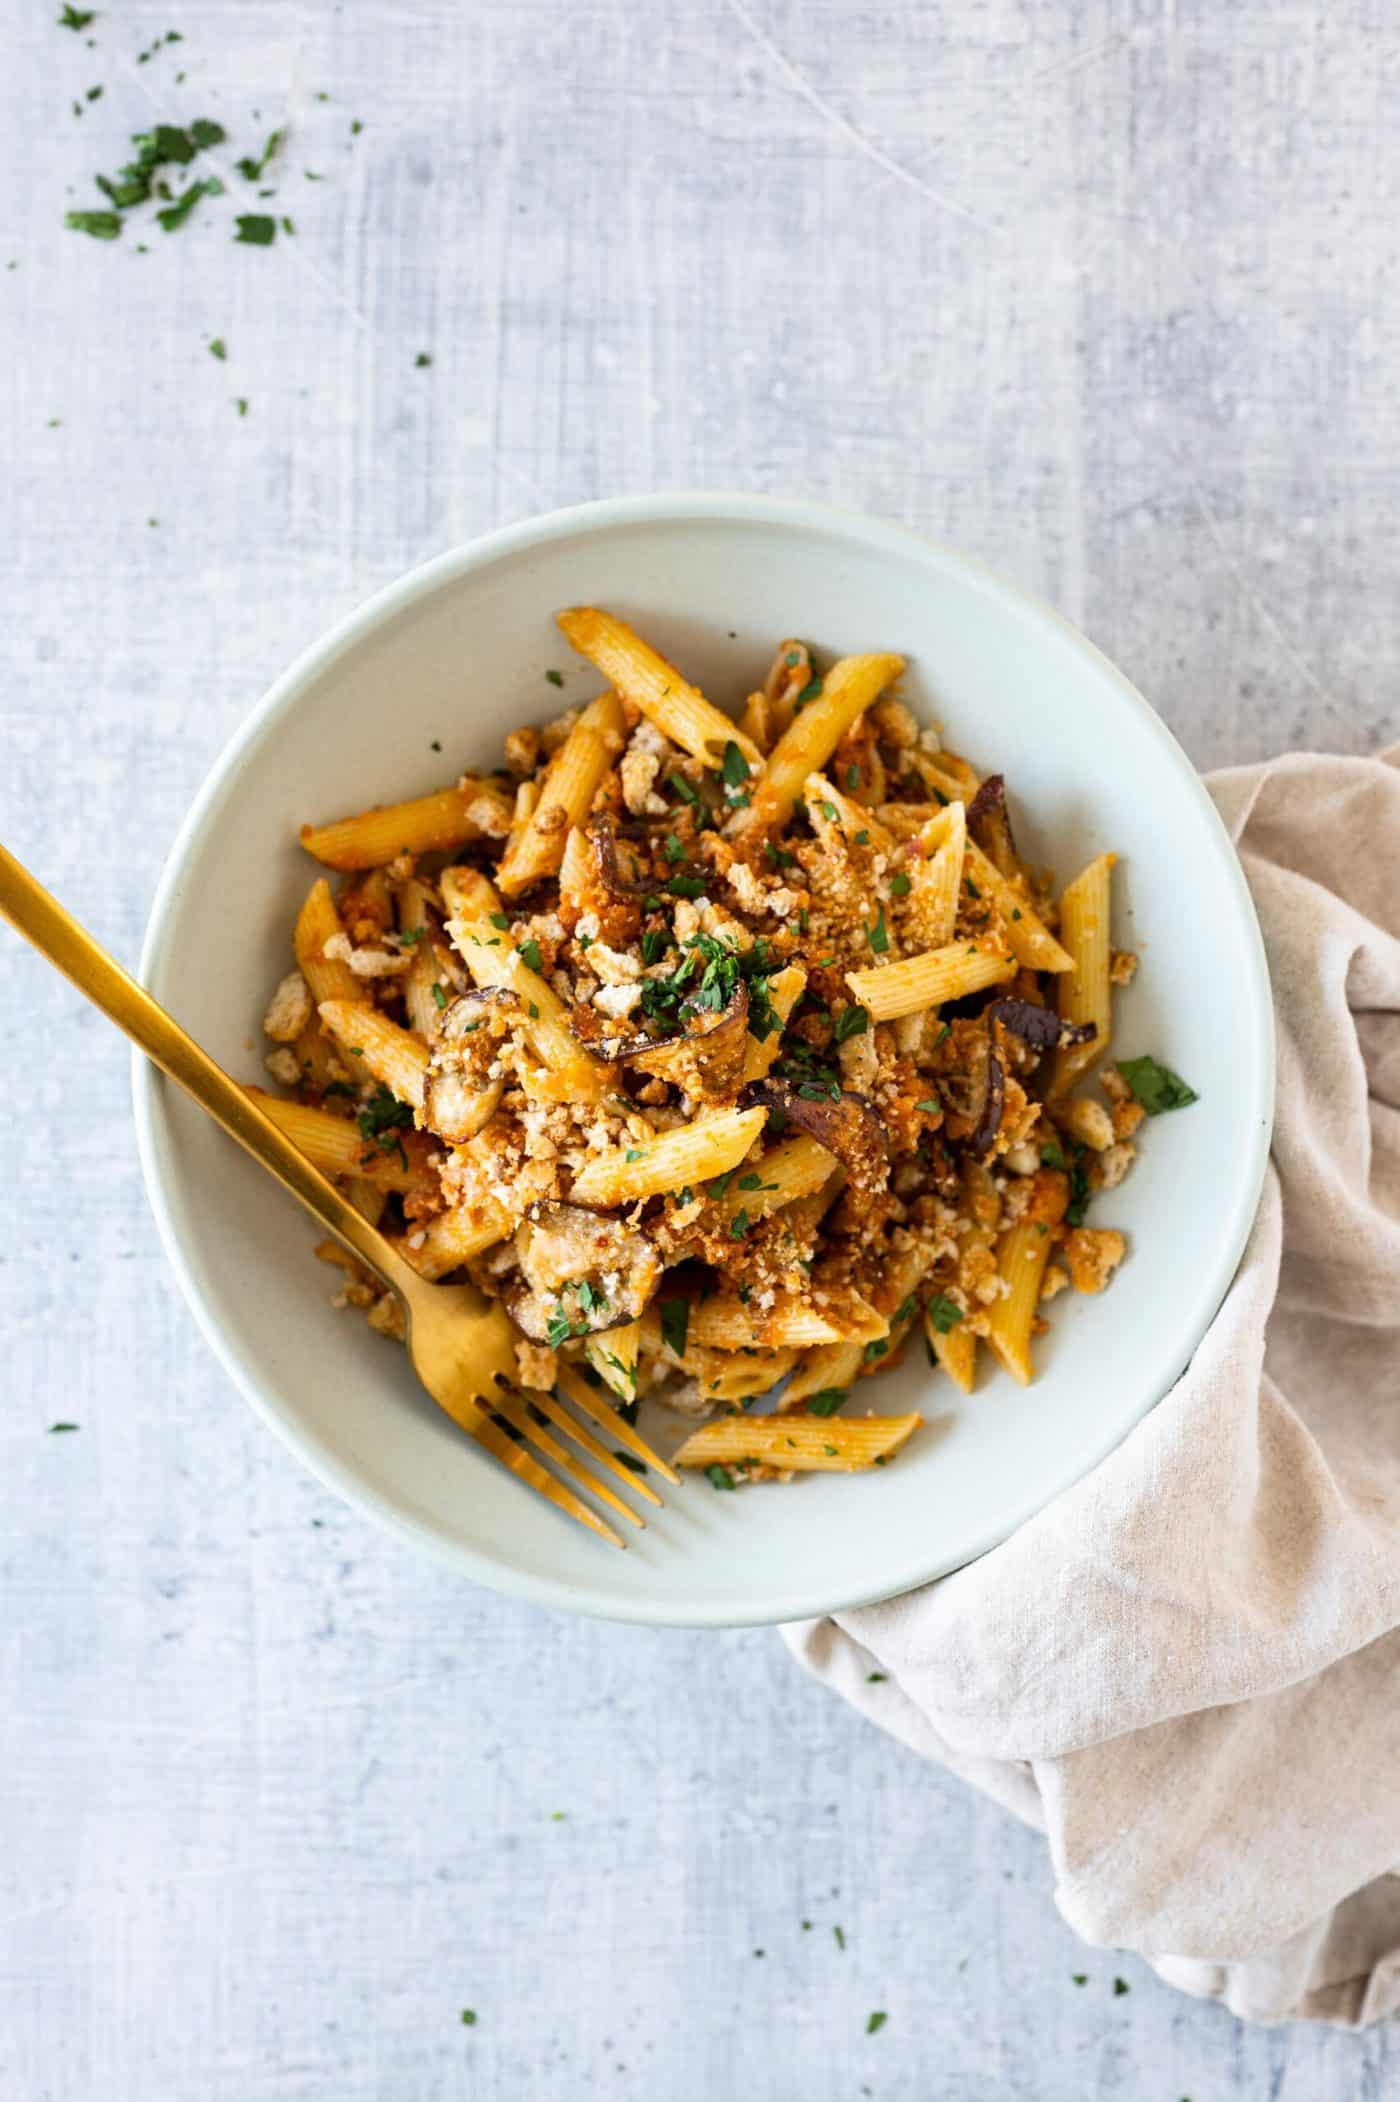 Easy Eggplant Parmesan Pasta recipe via thepigandquill #vegetarian #weeknightmeal #vegan